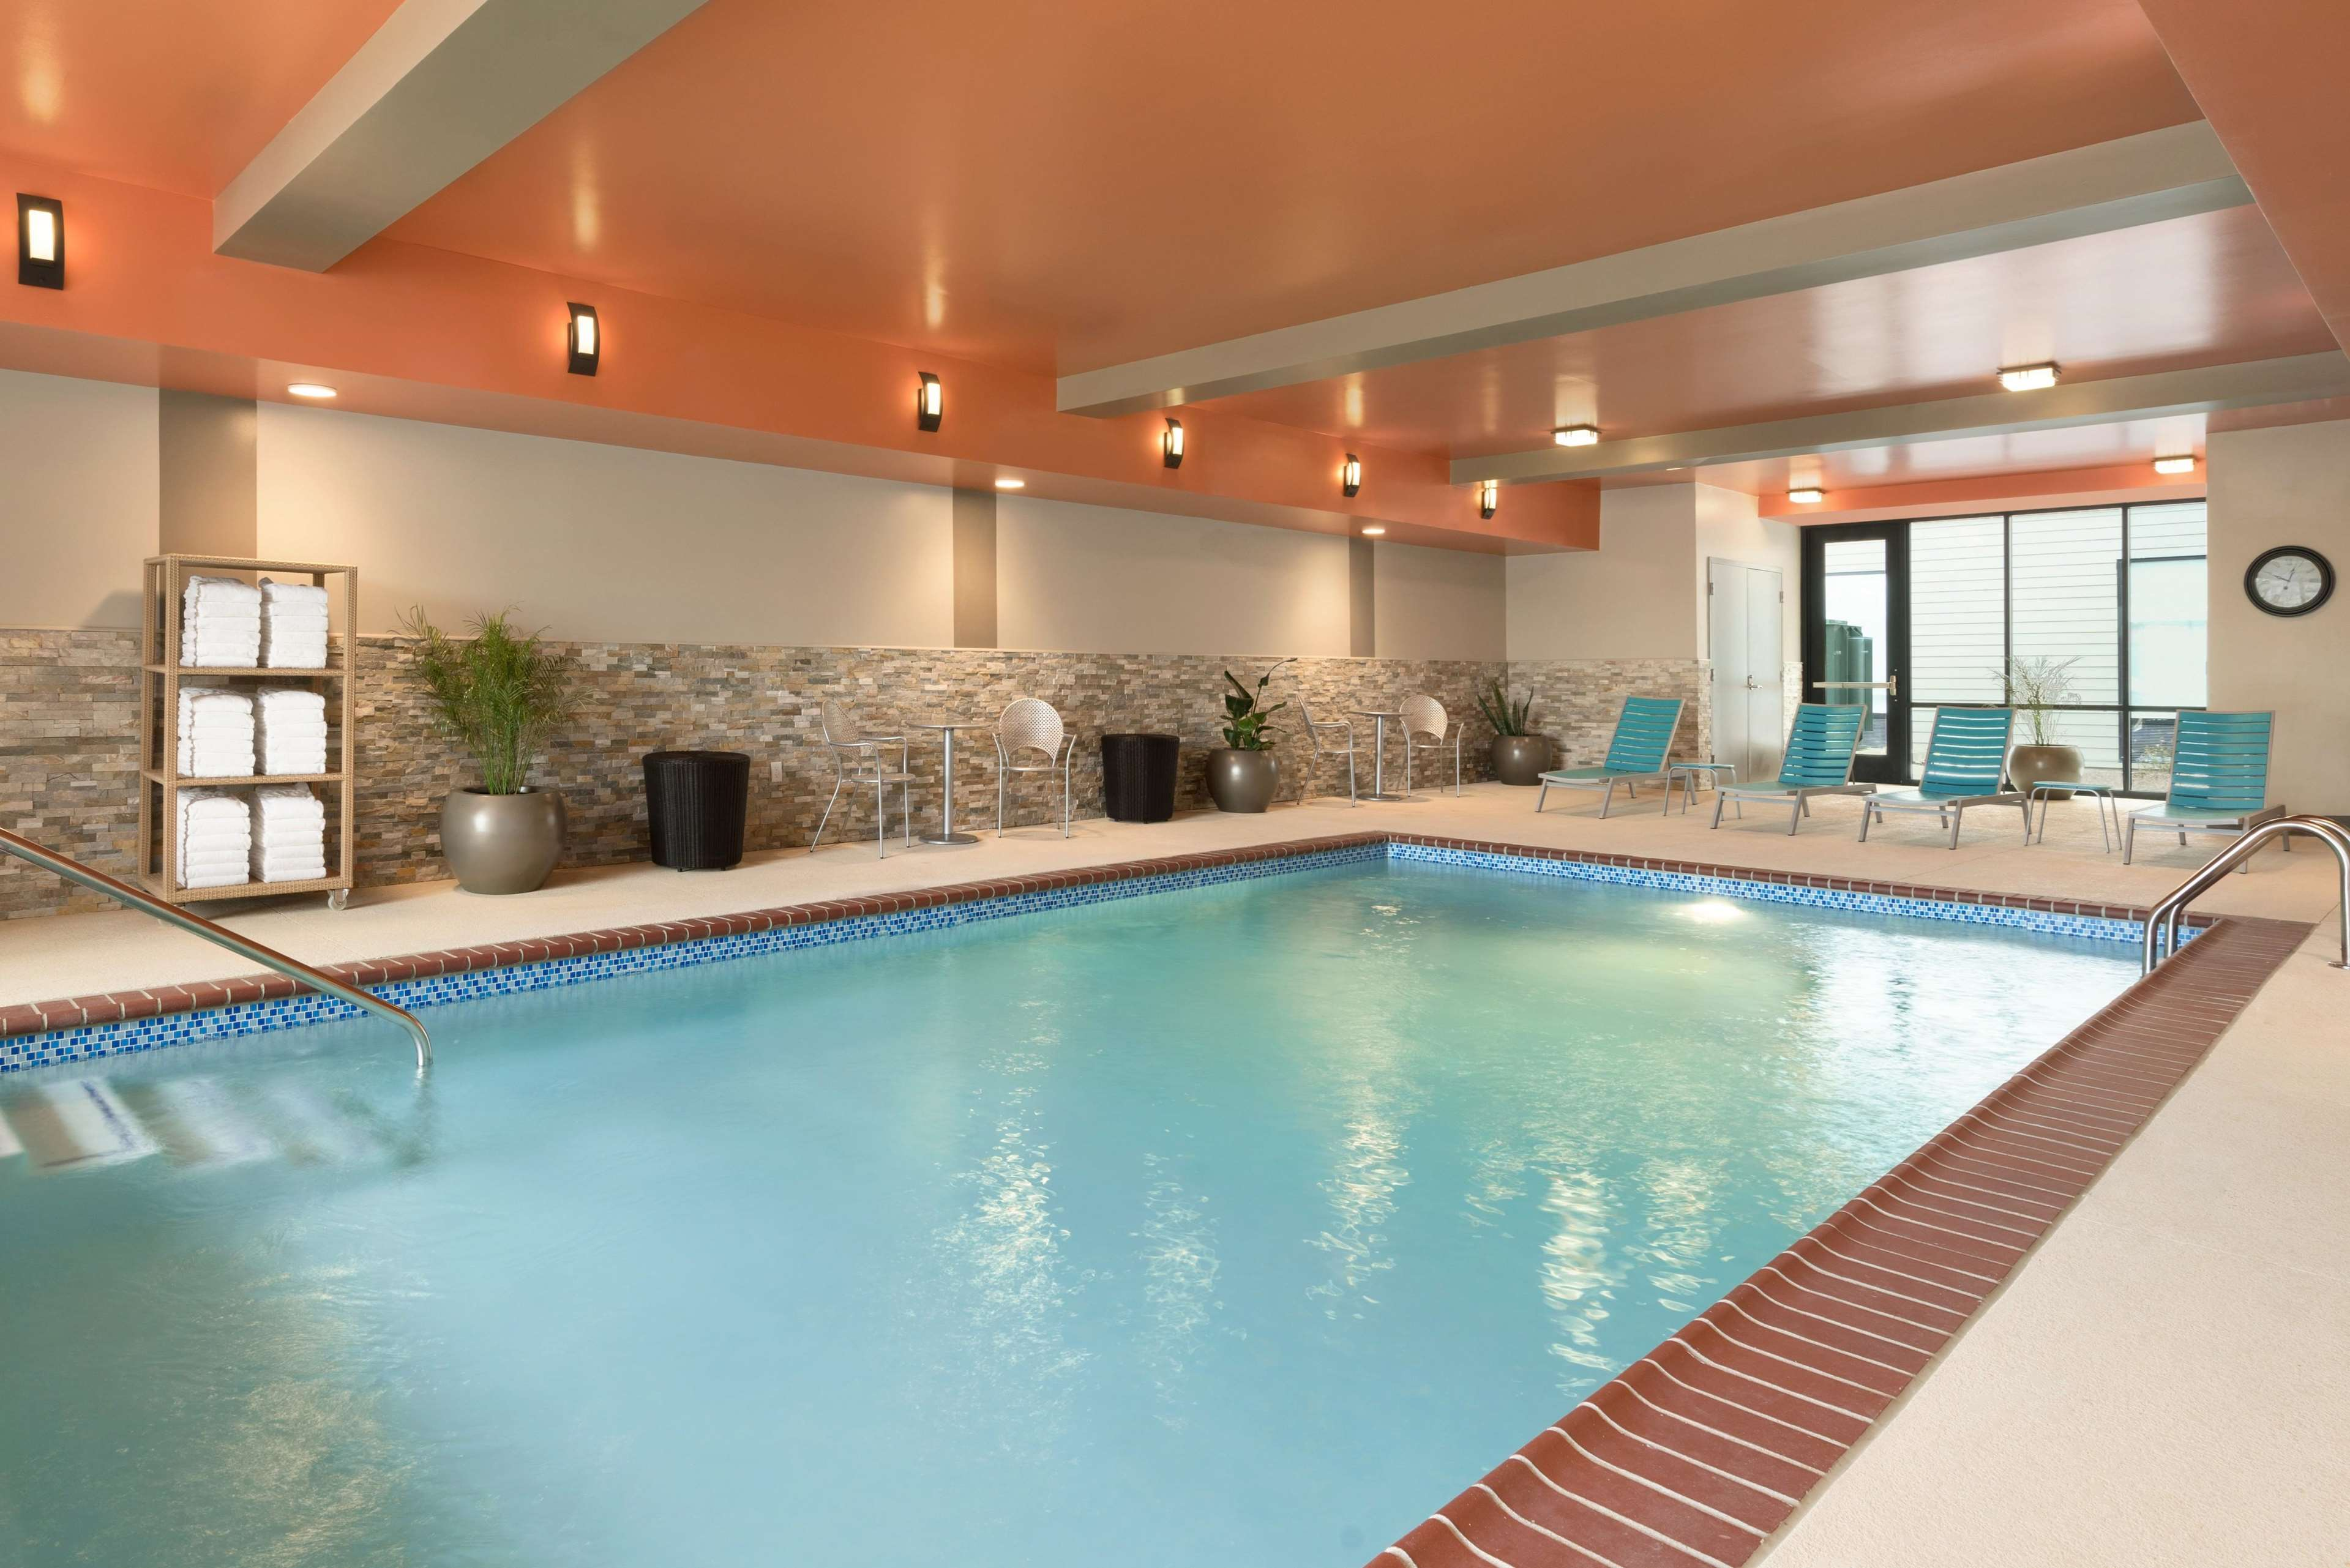 Home2 Suites by Hilton Leavenworth Downtown image 7